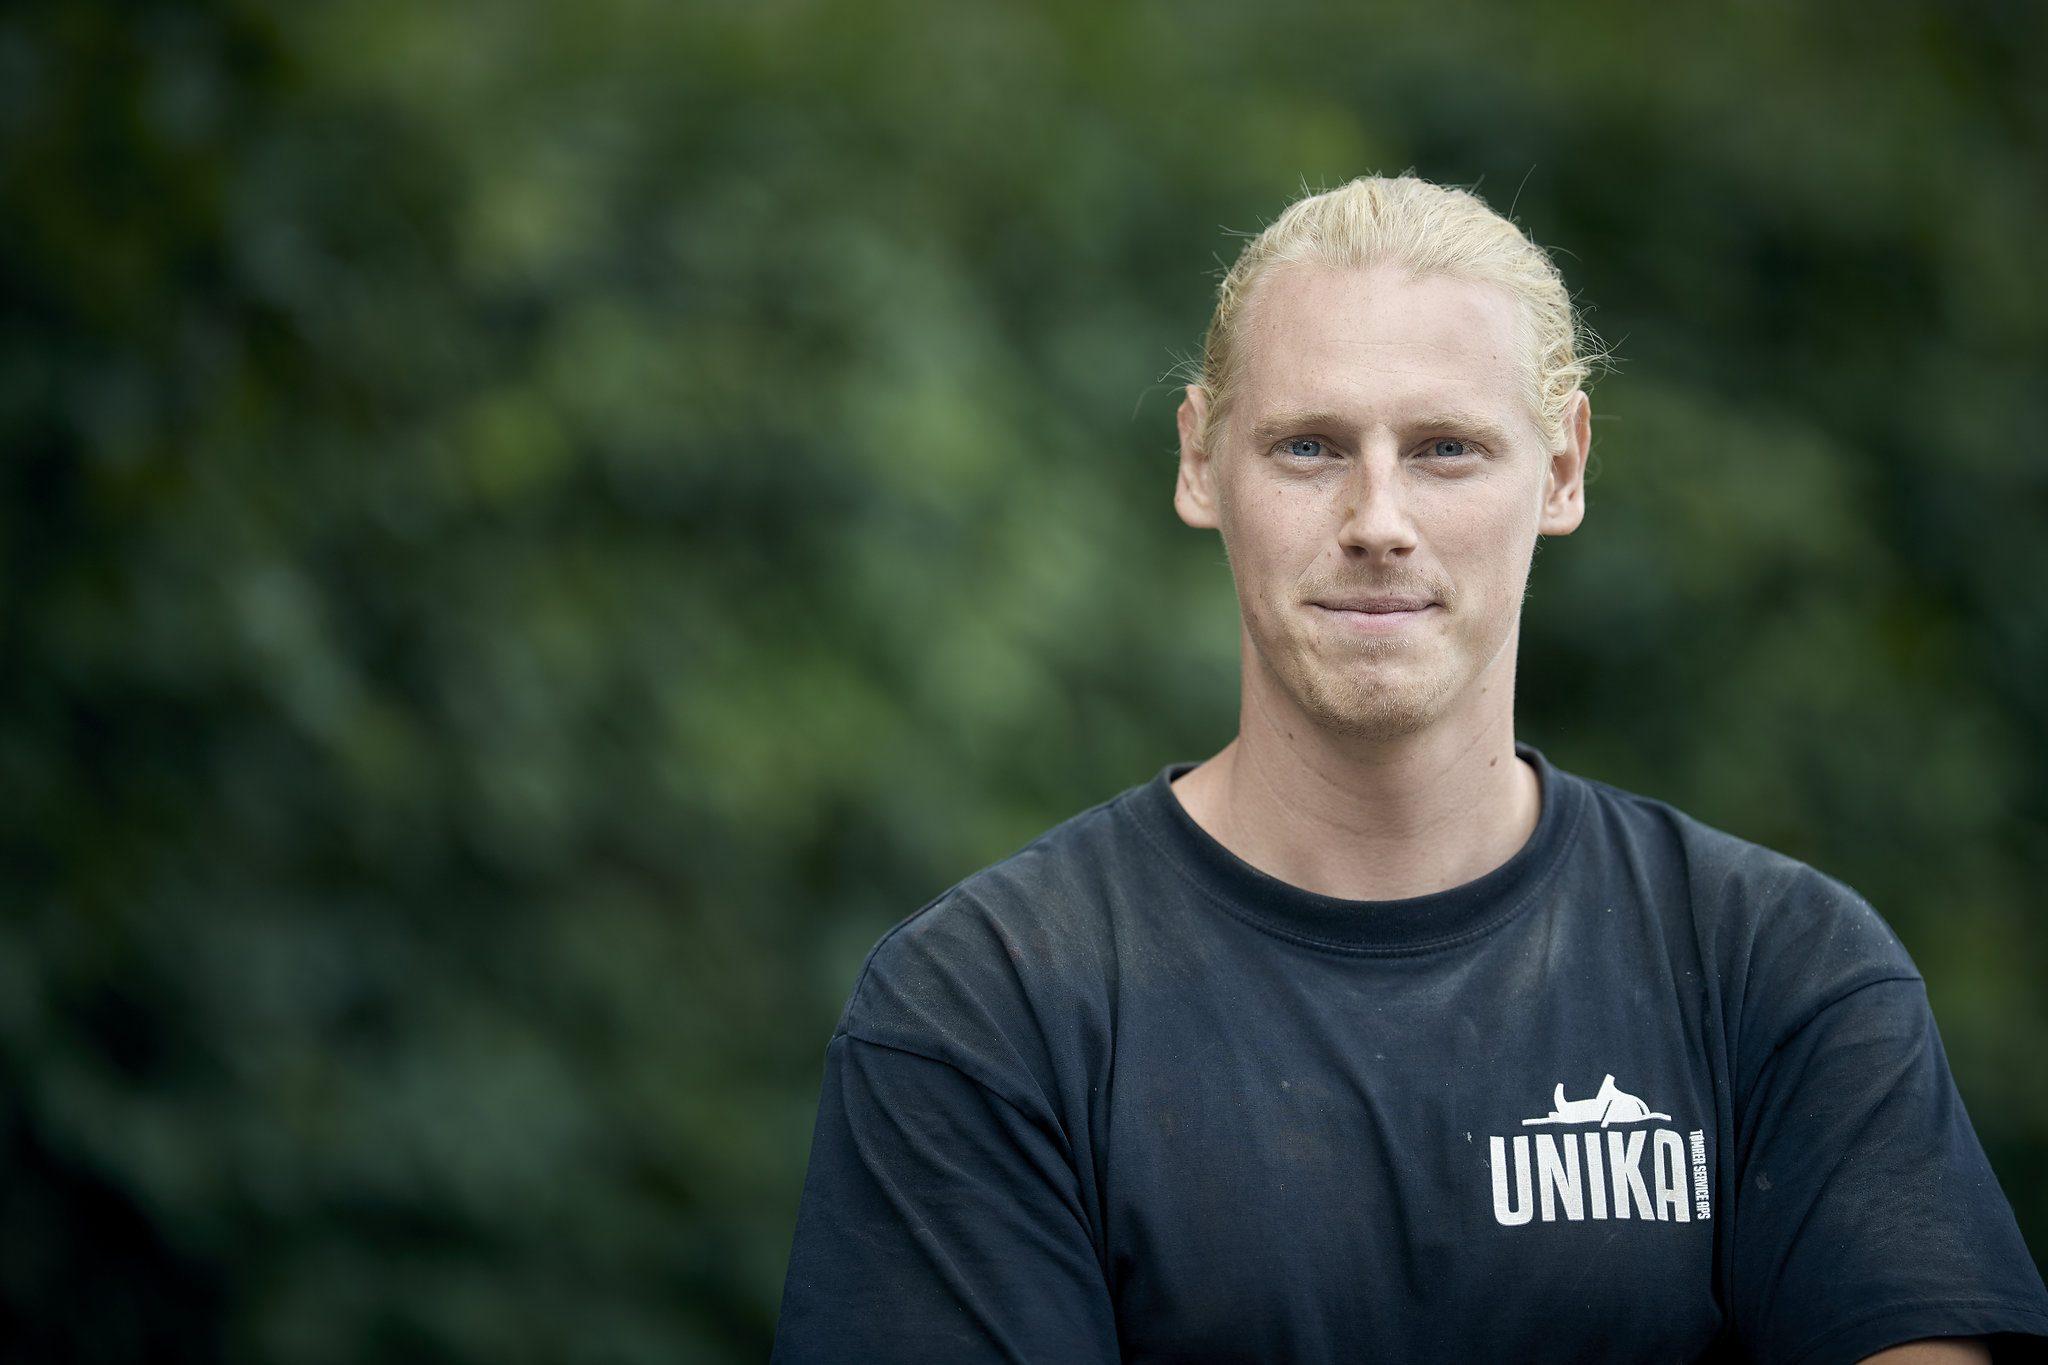 Frederik Kay - Unika Tømrerservice ApS